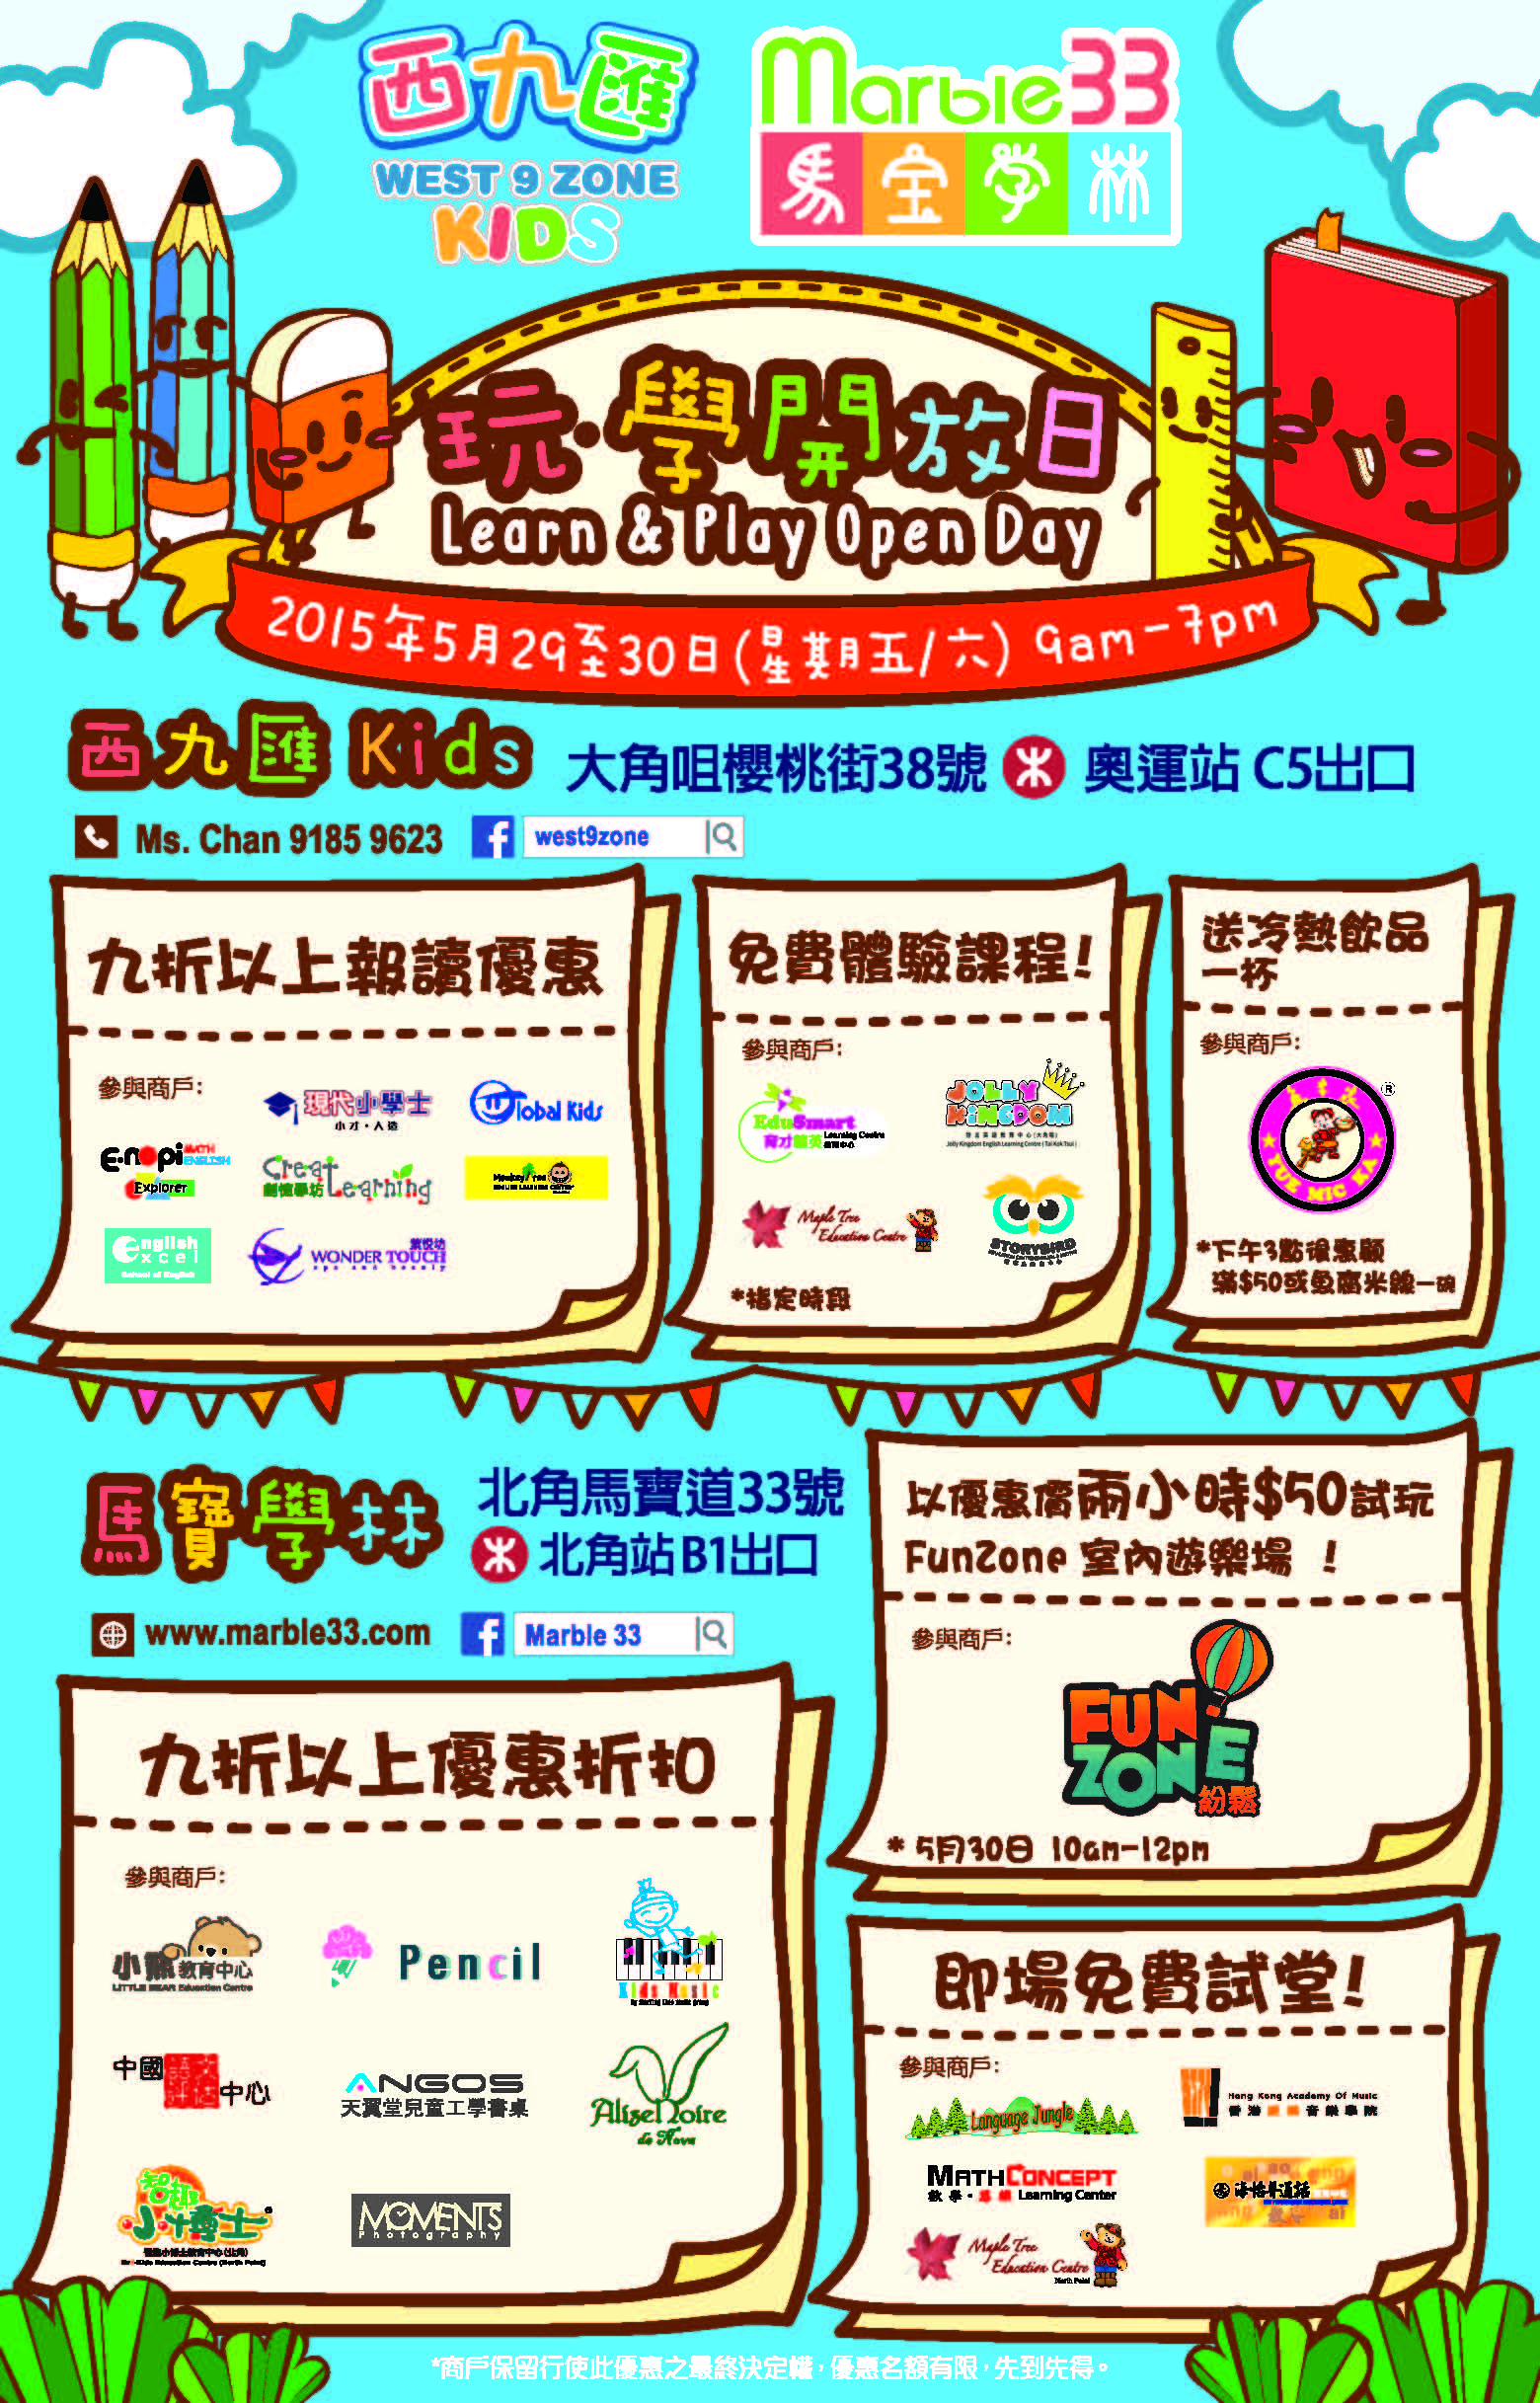 2015.05.29-30-Learn & Play, Open Day Advertisement.jpg